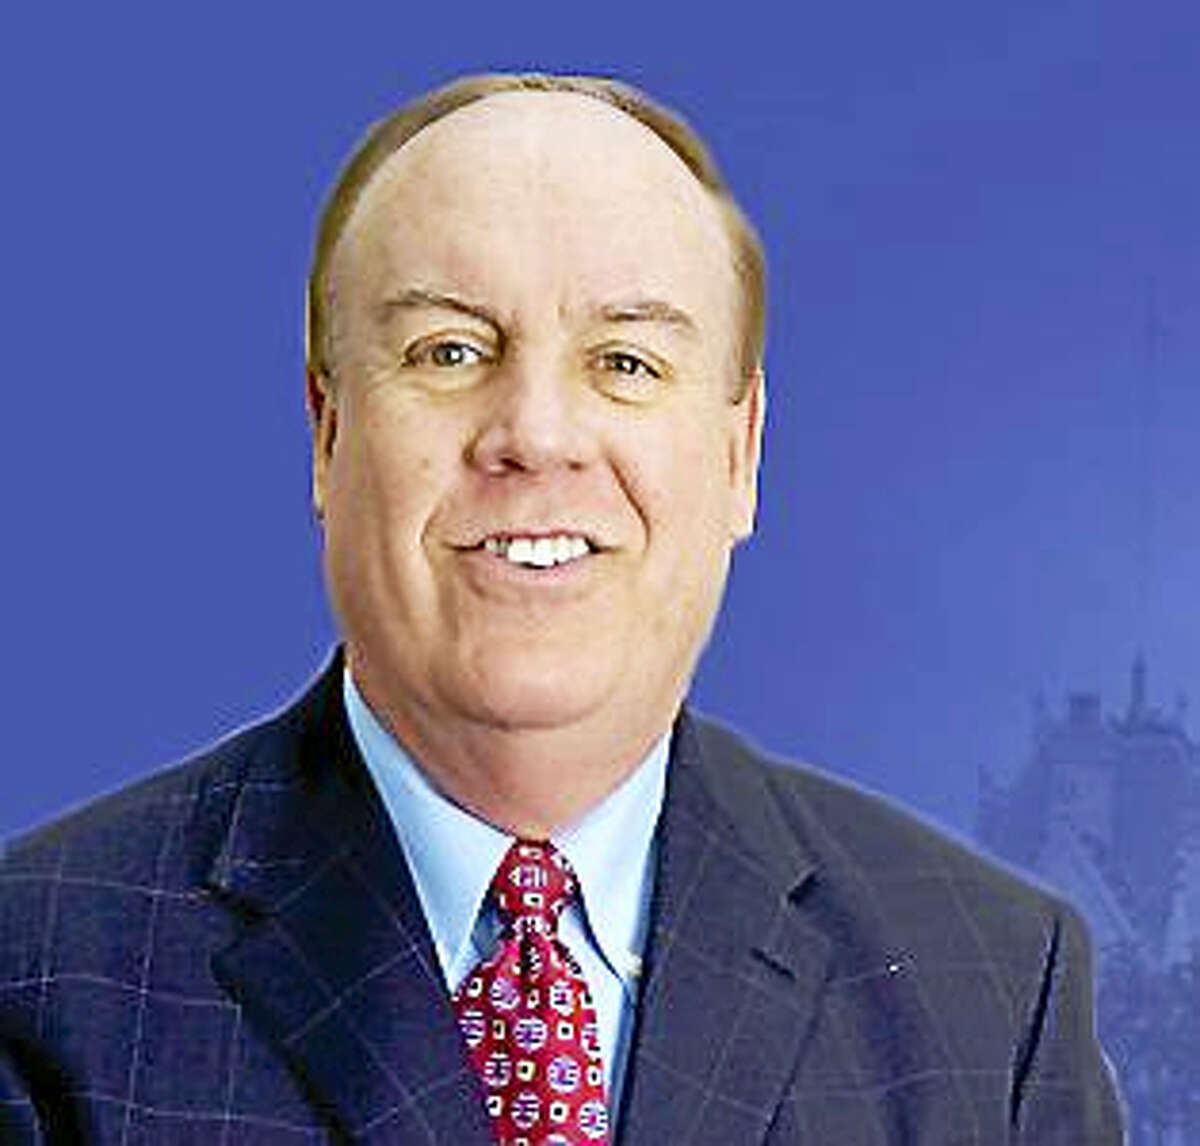 State Rep. Stephen Dargan, D-West Haven